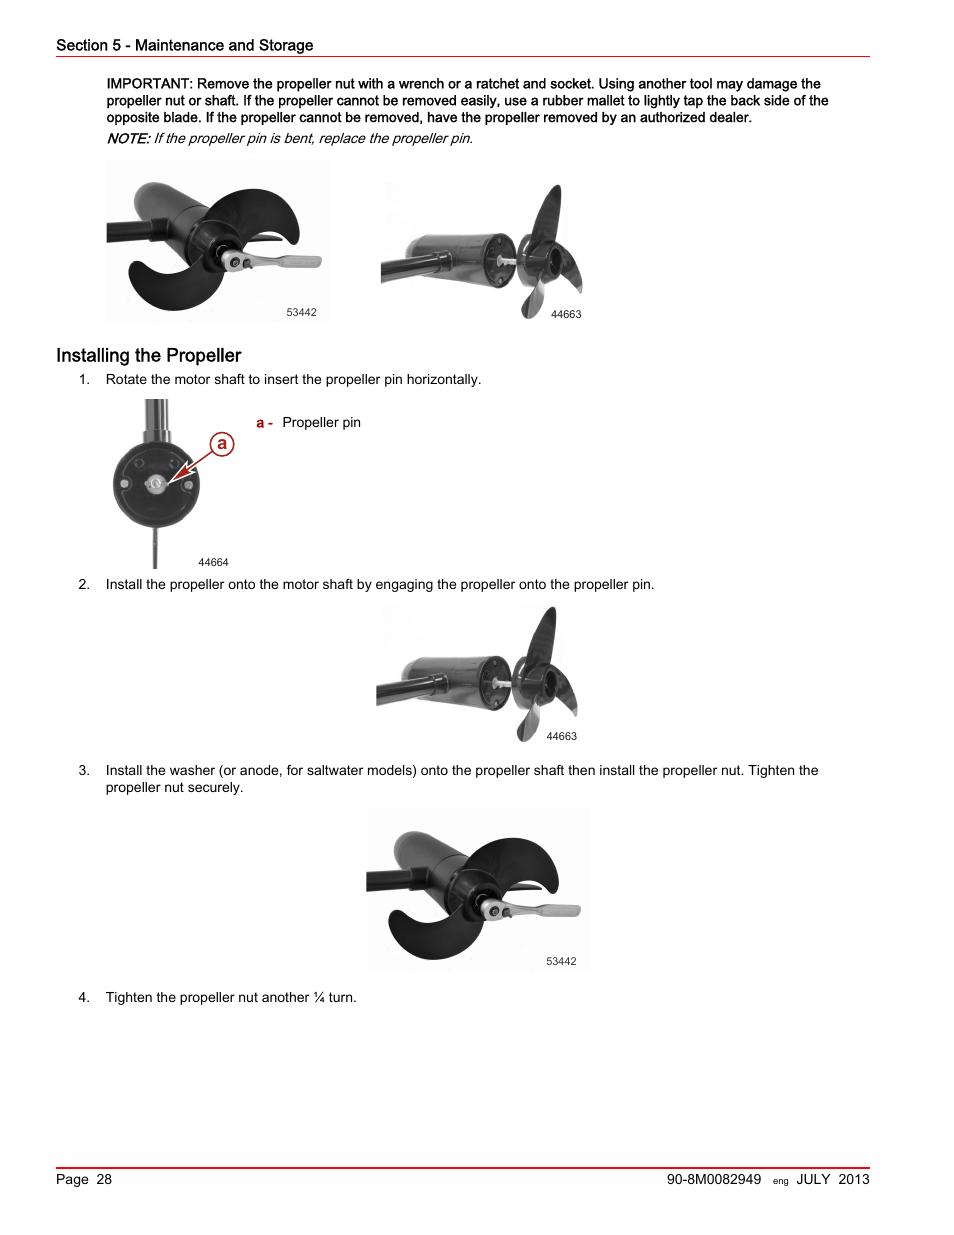 Installing the propeller | MotorGuide Xi5 Wireless Trolling